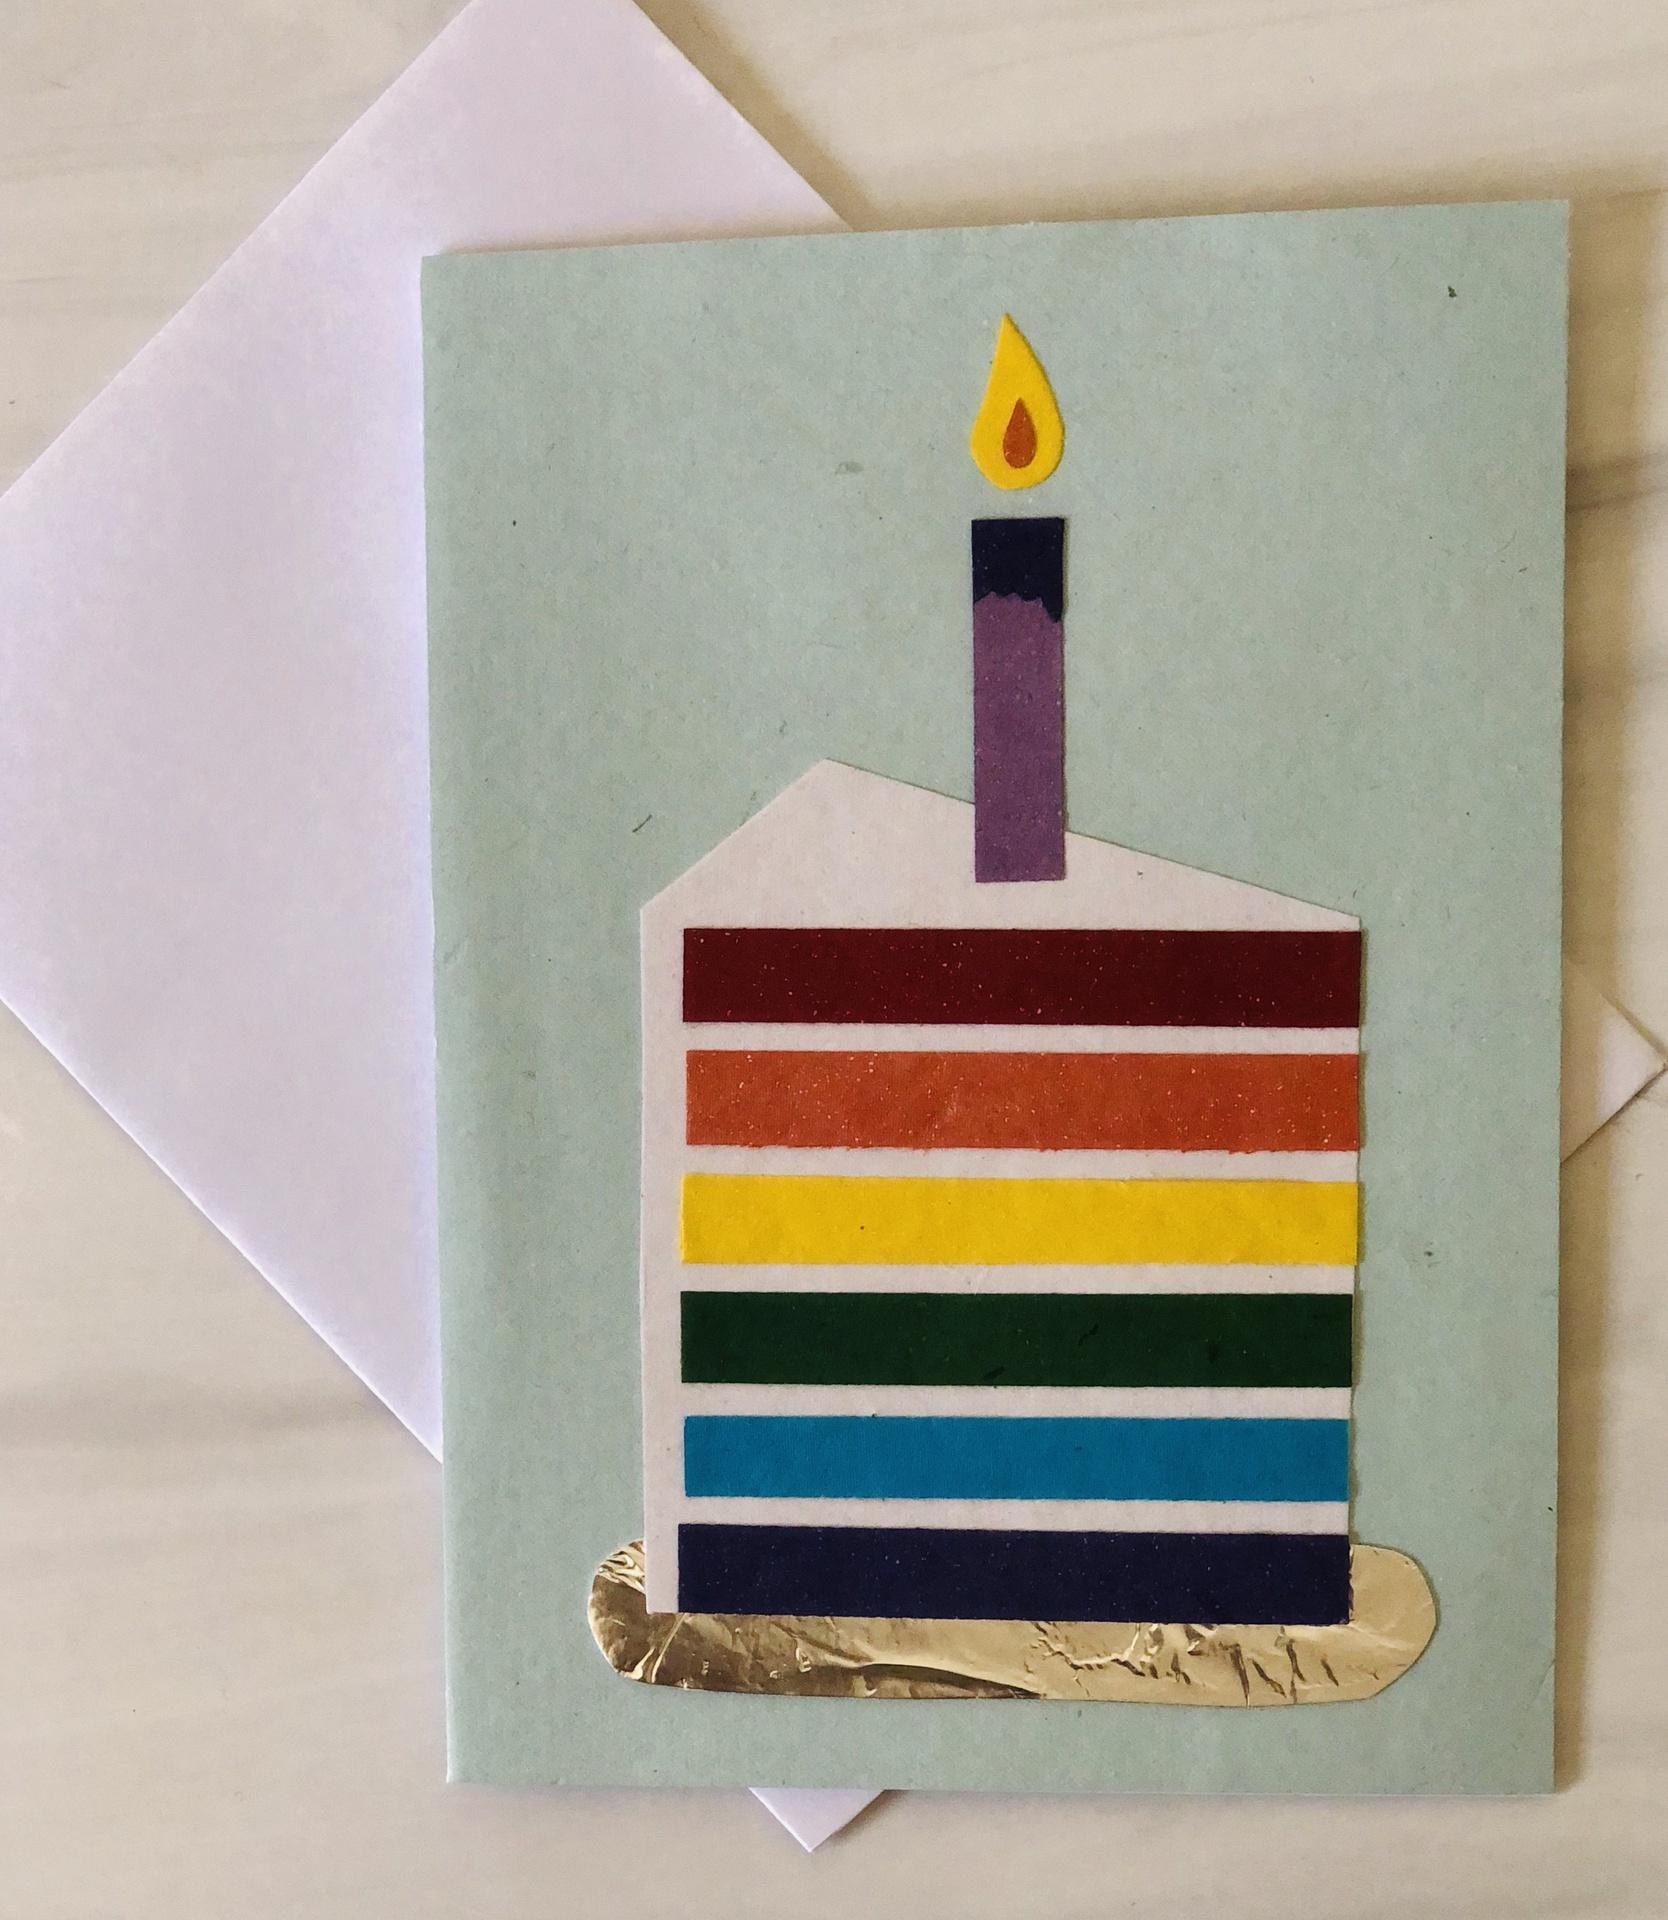 Rainbow Cake, Blank Greeting Card